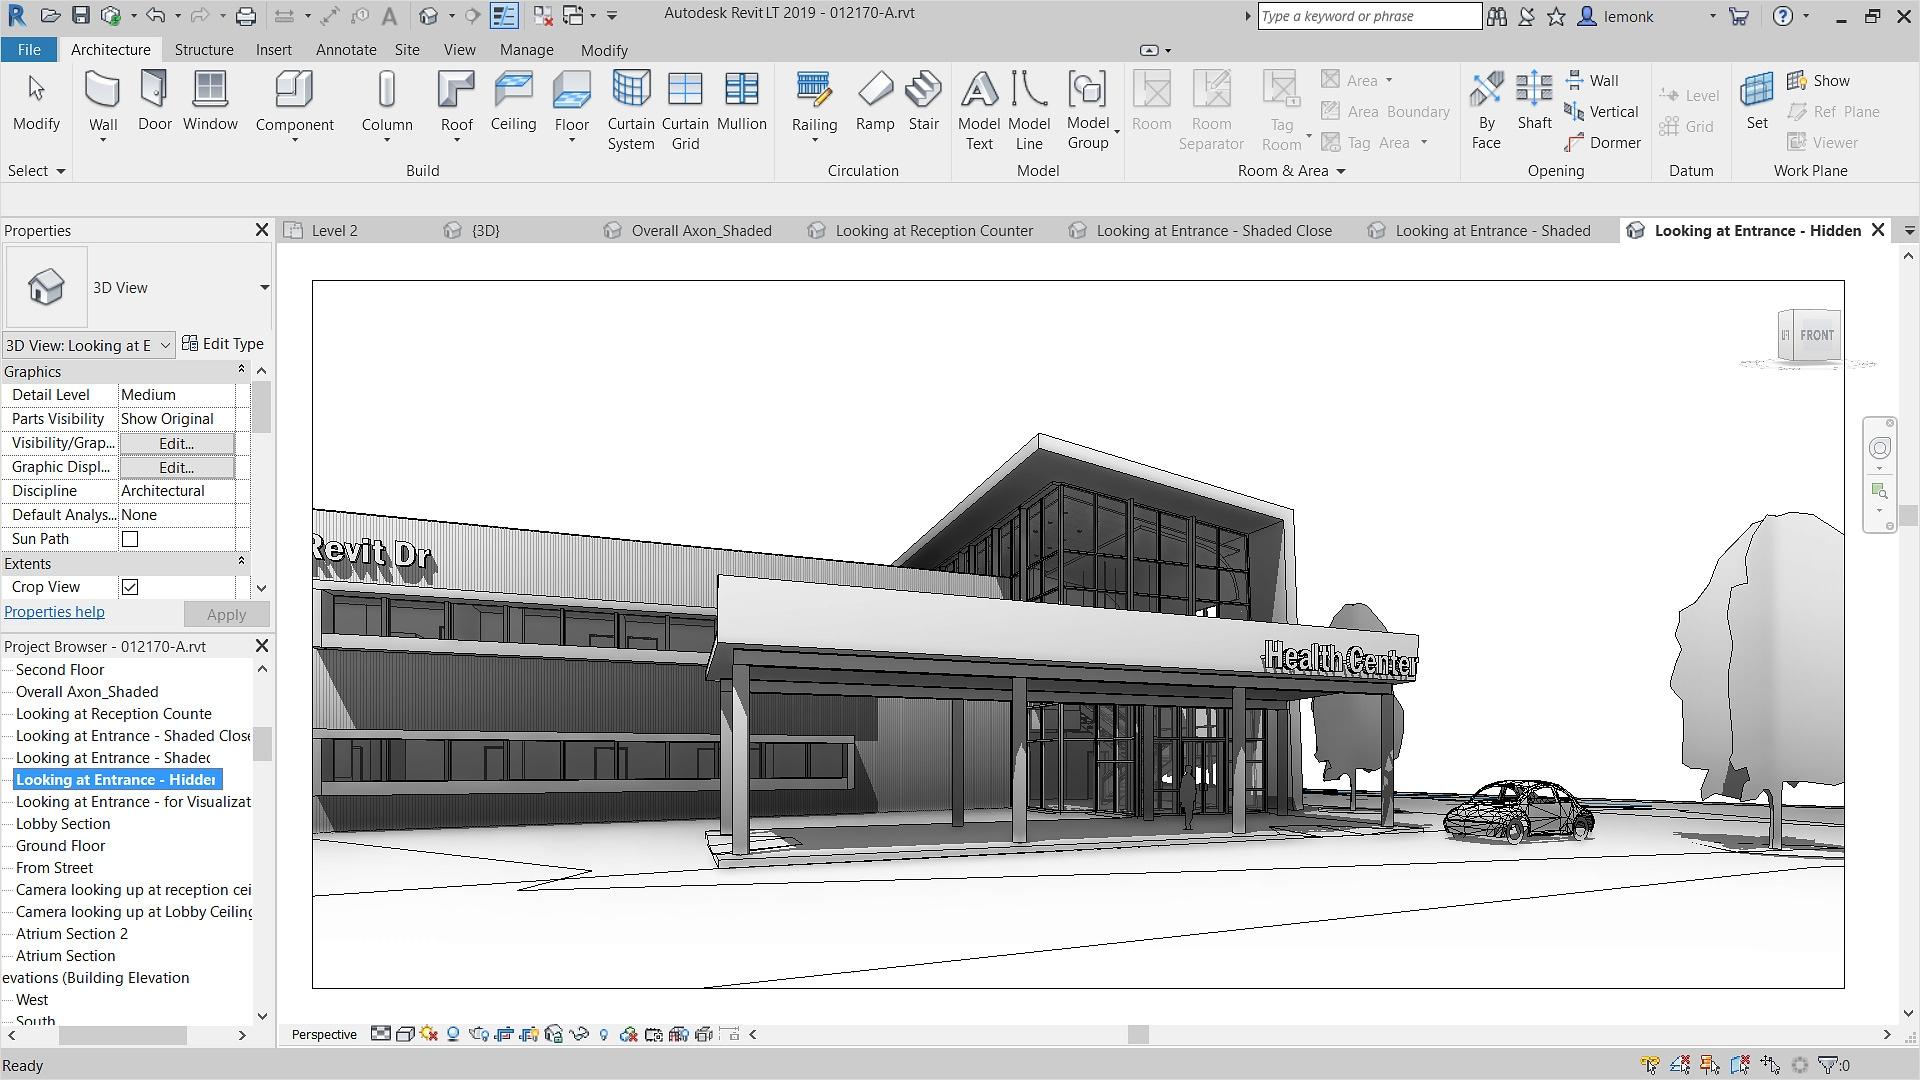 Recursos de software de design de arquitetura 3d revit for Software architettura 3d